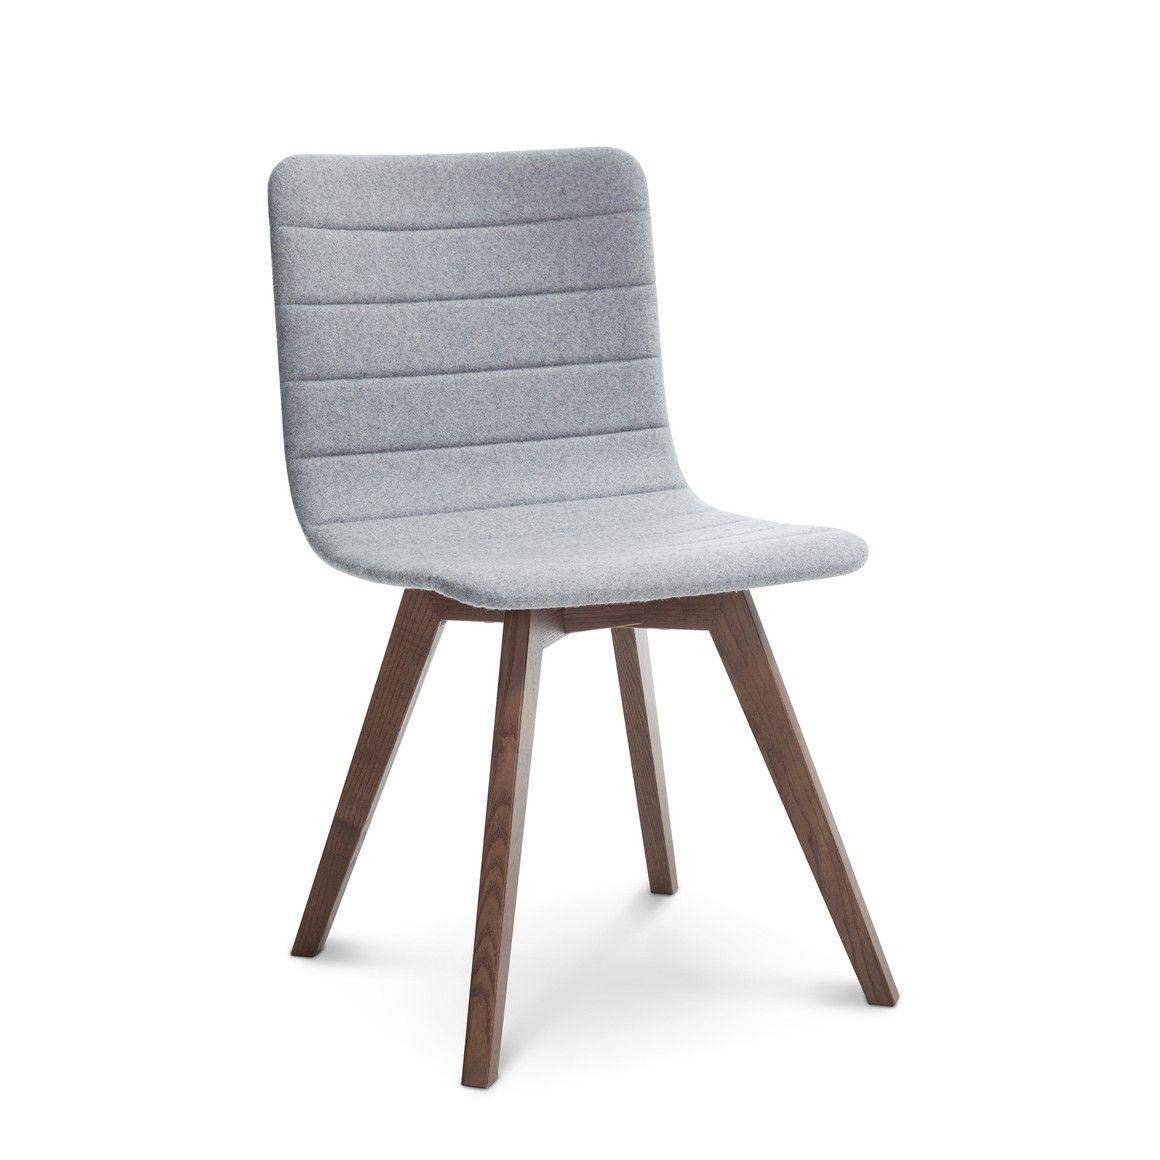 Stuhl Bond Grau Esche 14935700 0 Stuhle Online Mobel Stuhl Stoff